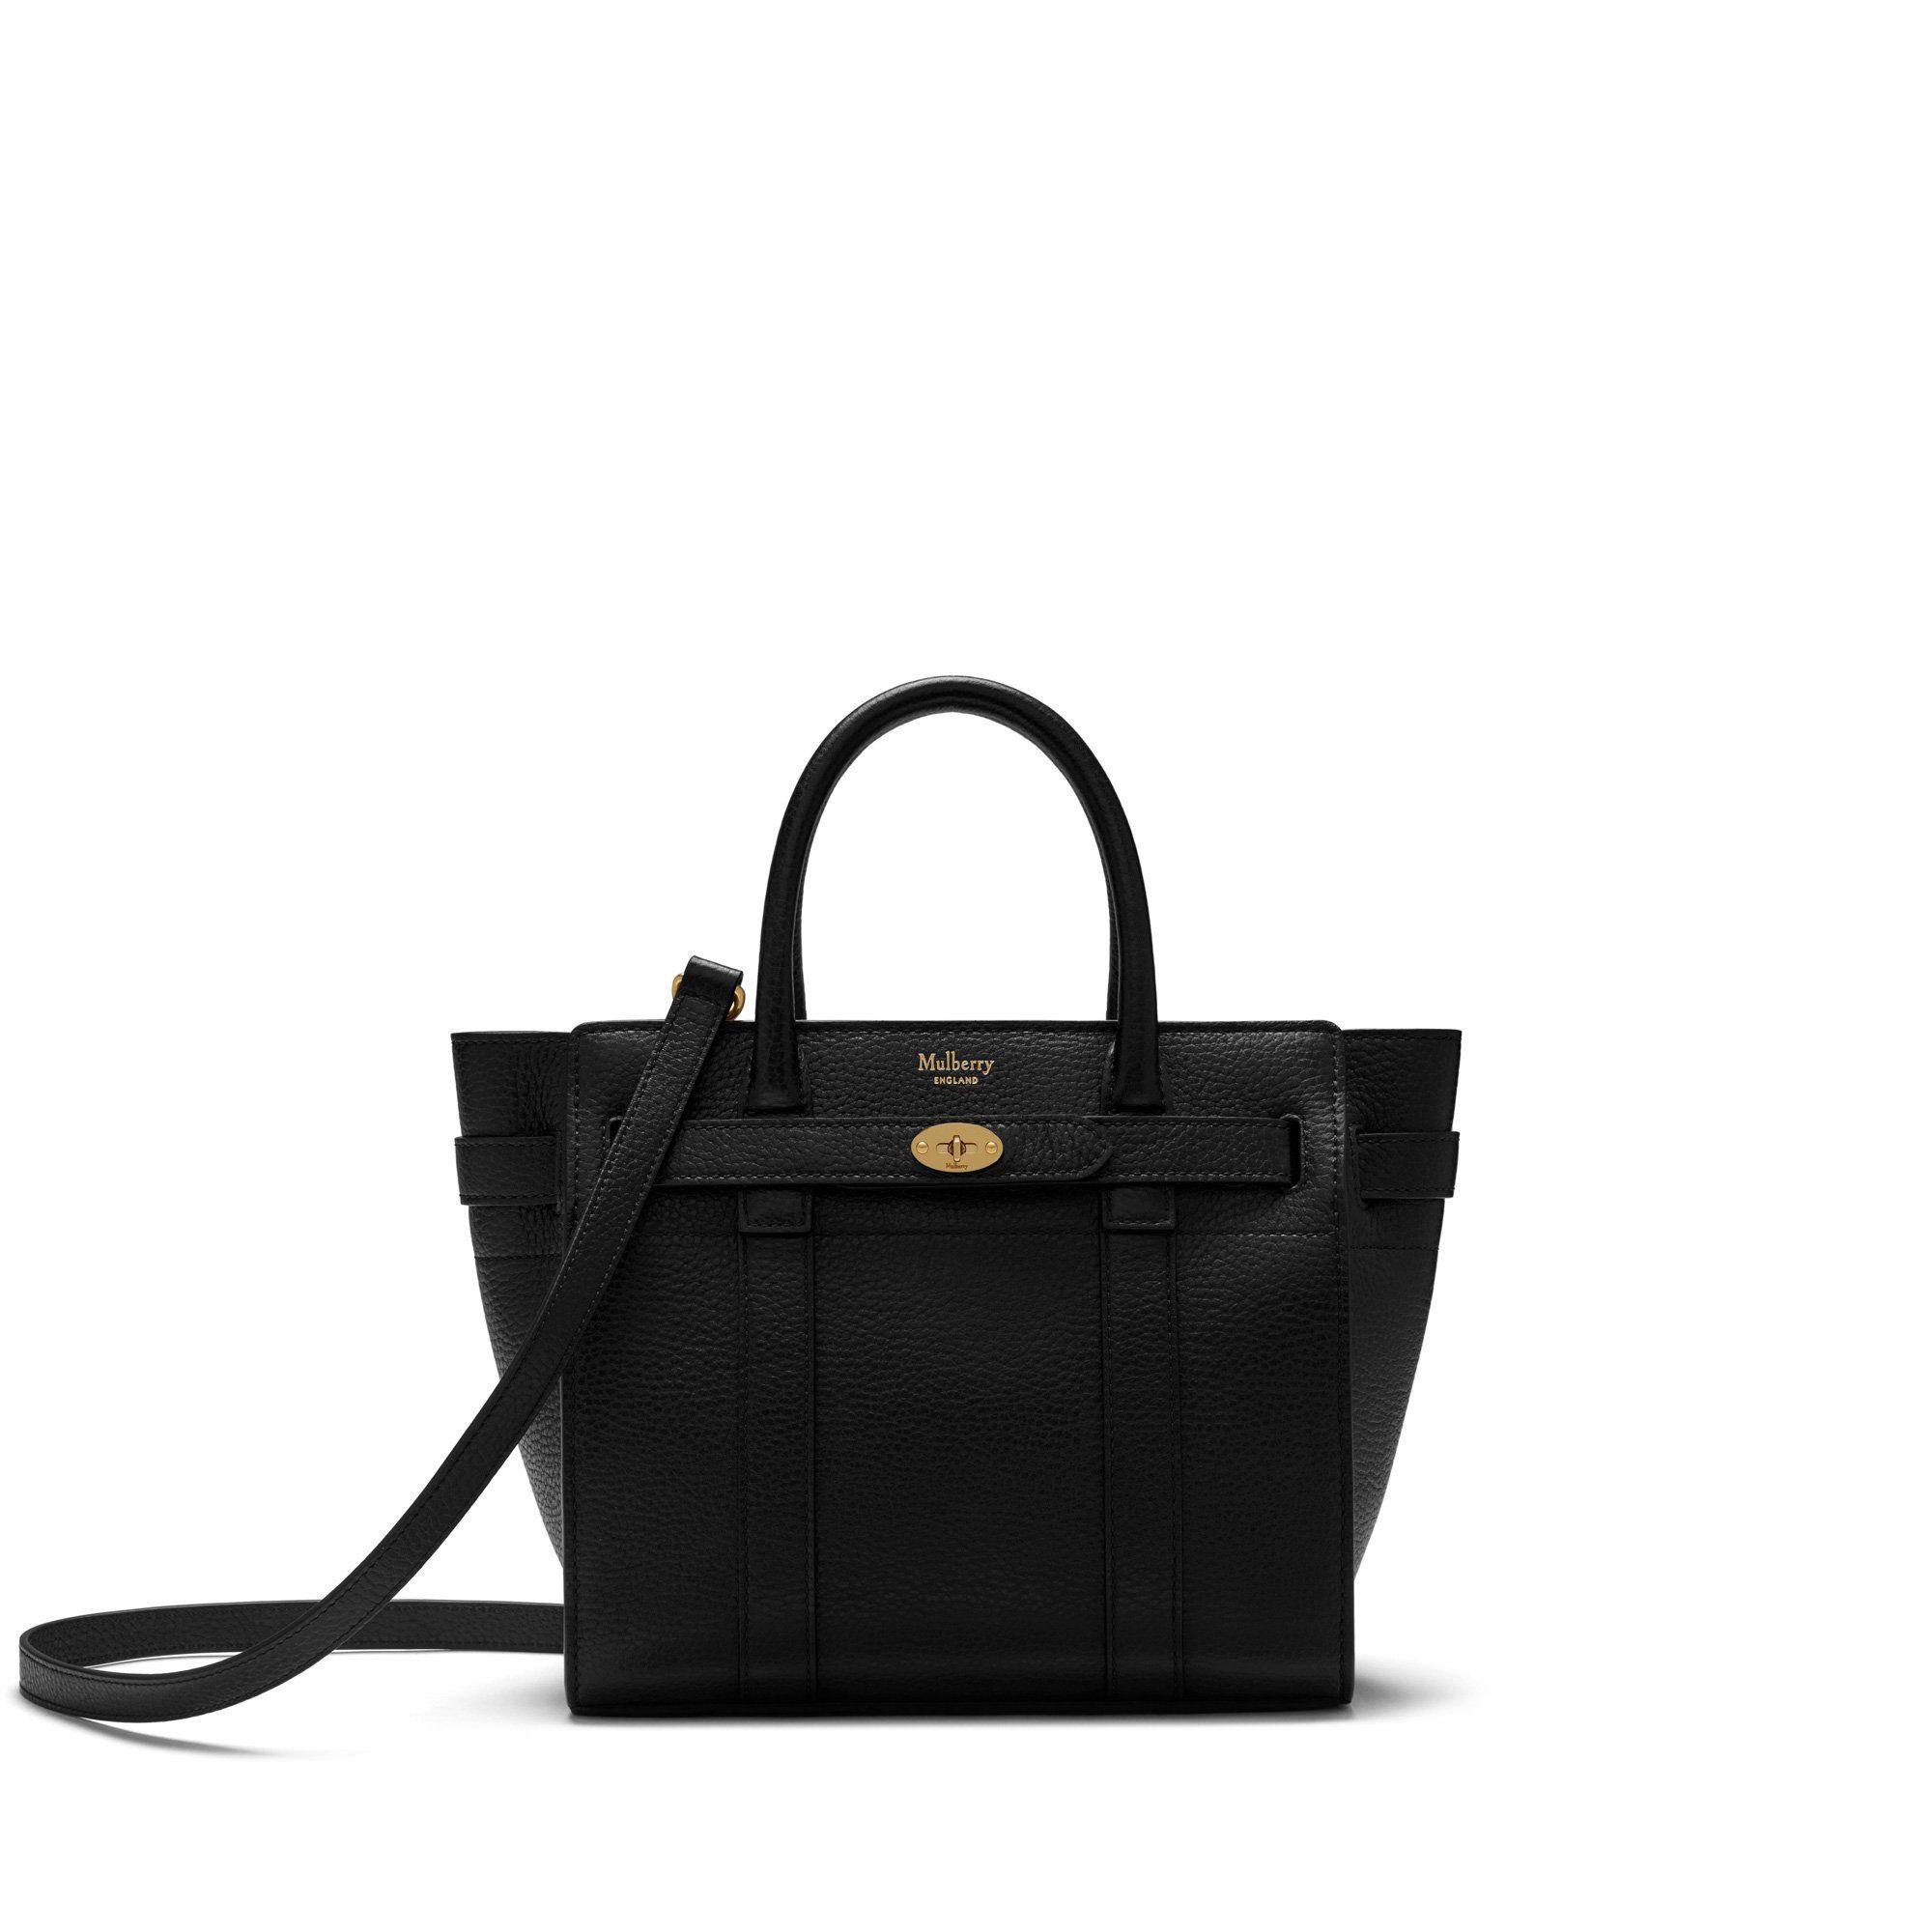 e87d7a04c6 Women s Bags